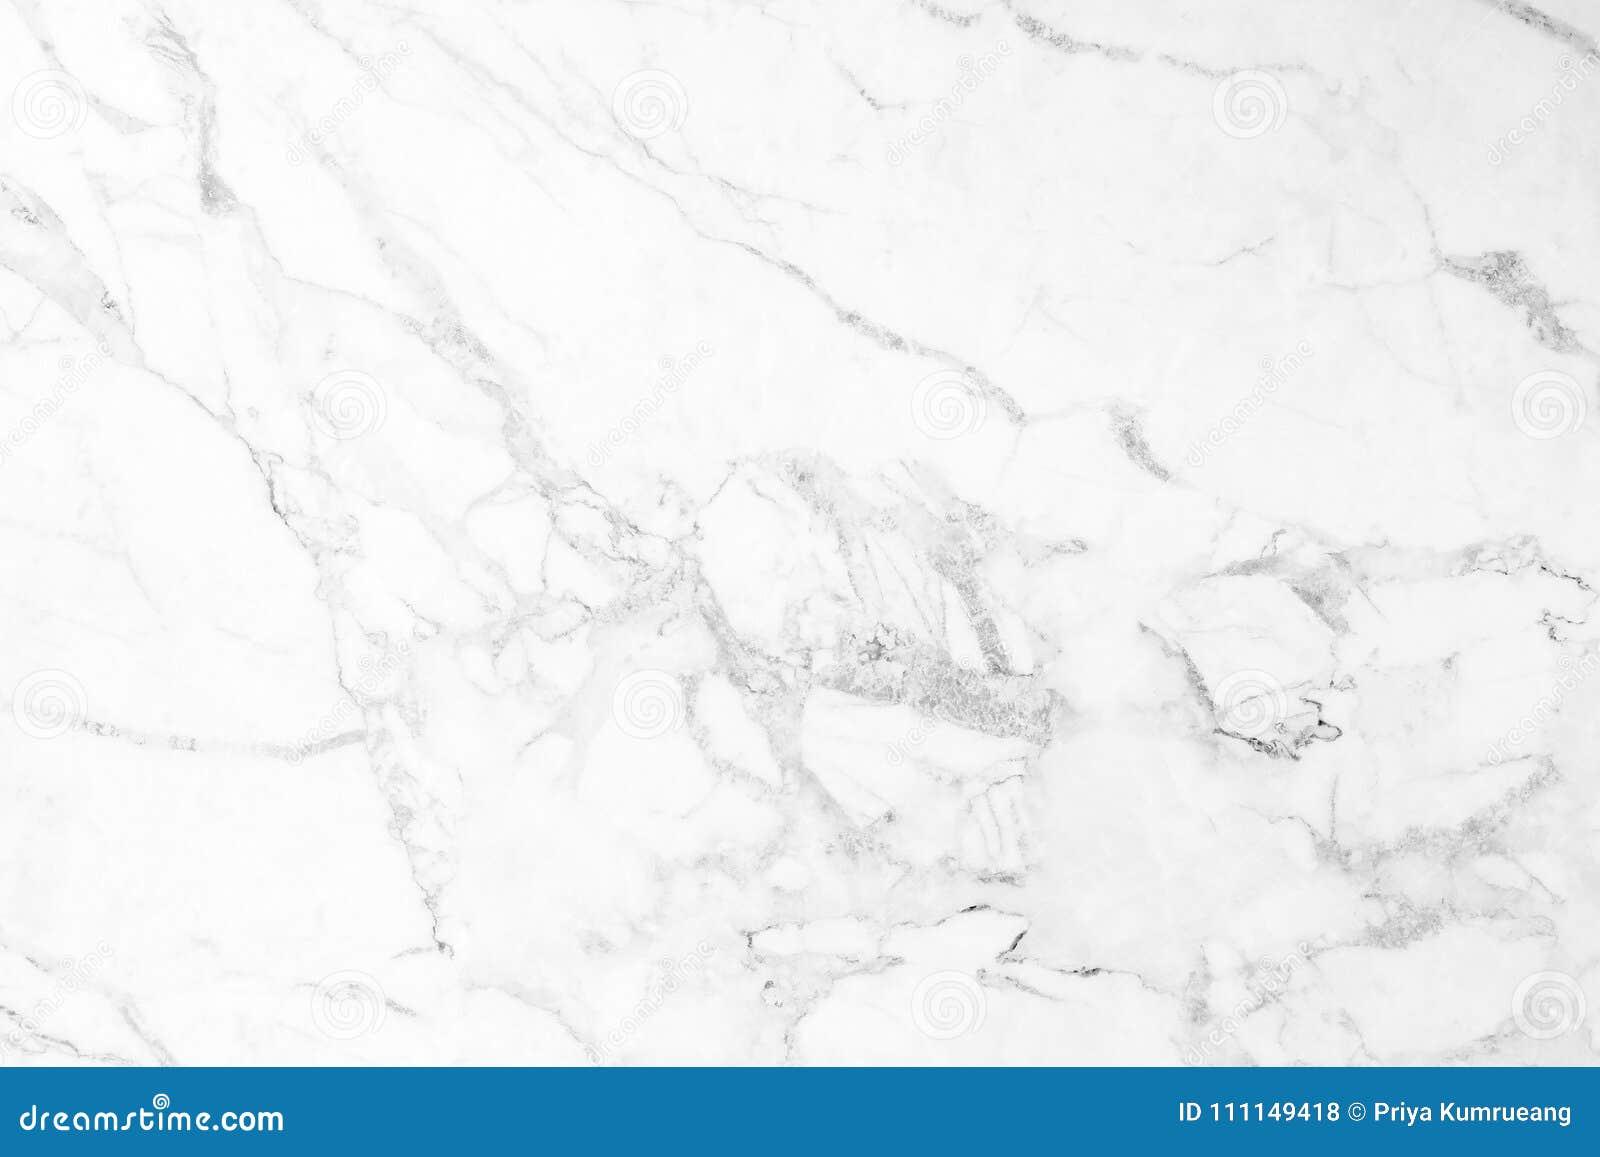 Vit marmor mönstrad texturbakgrund